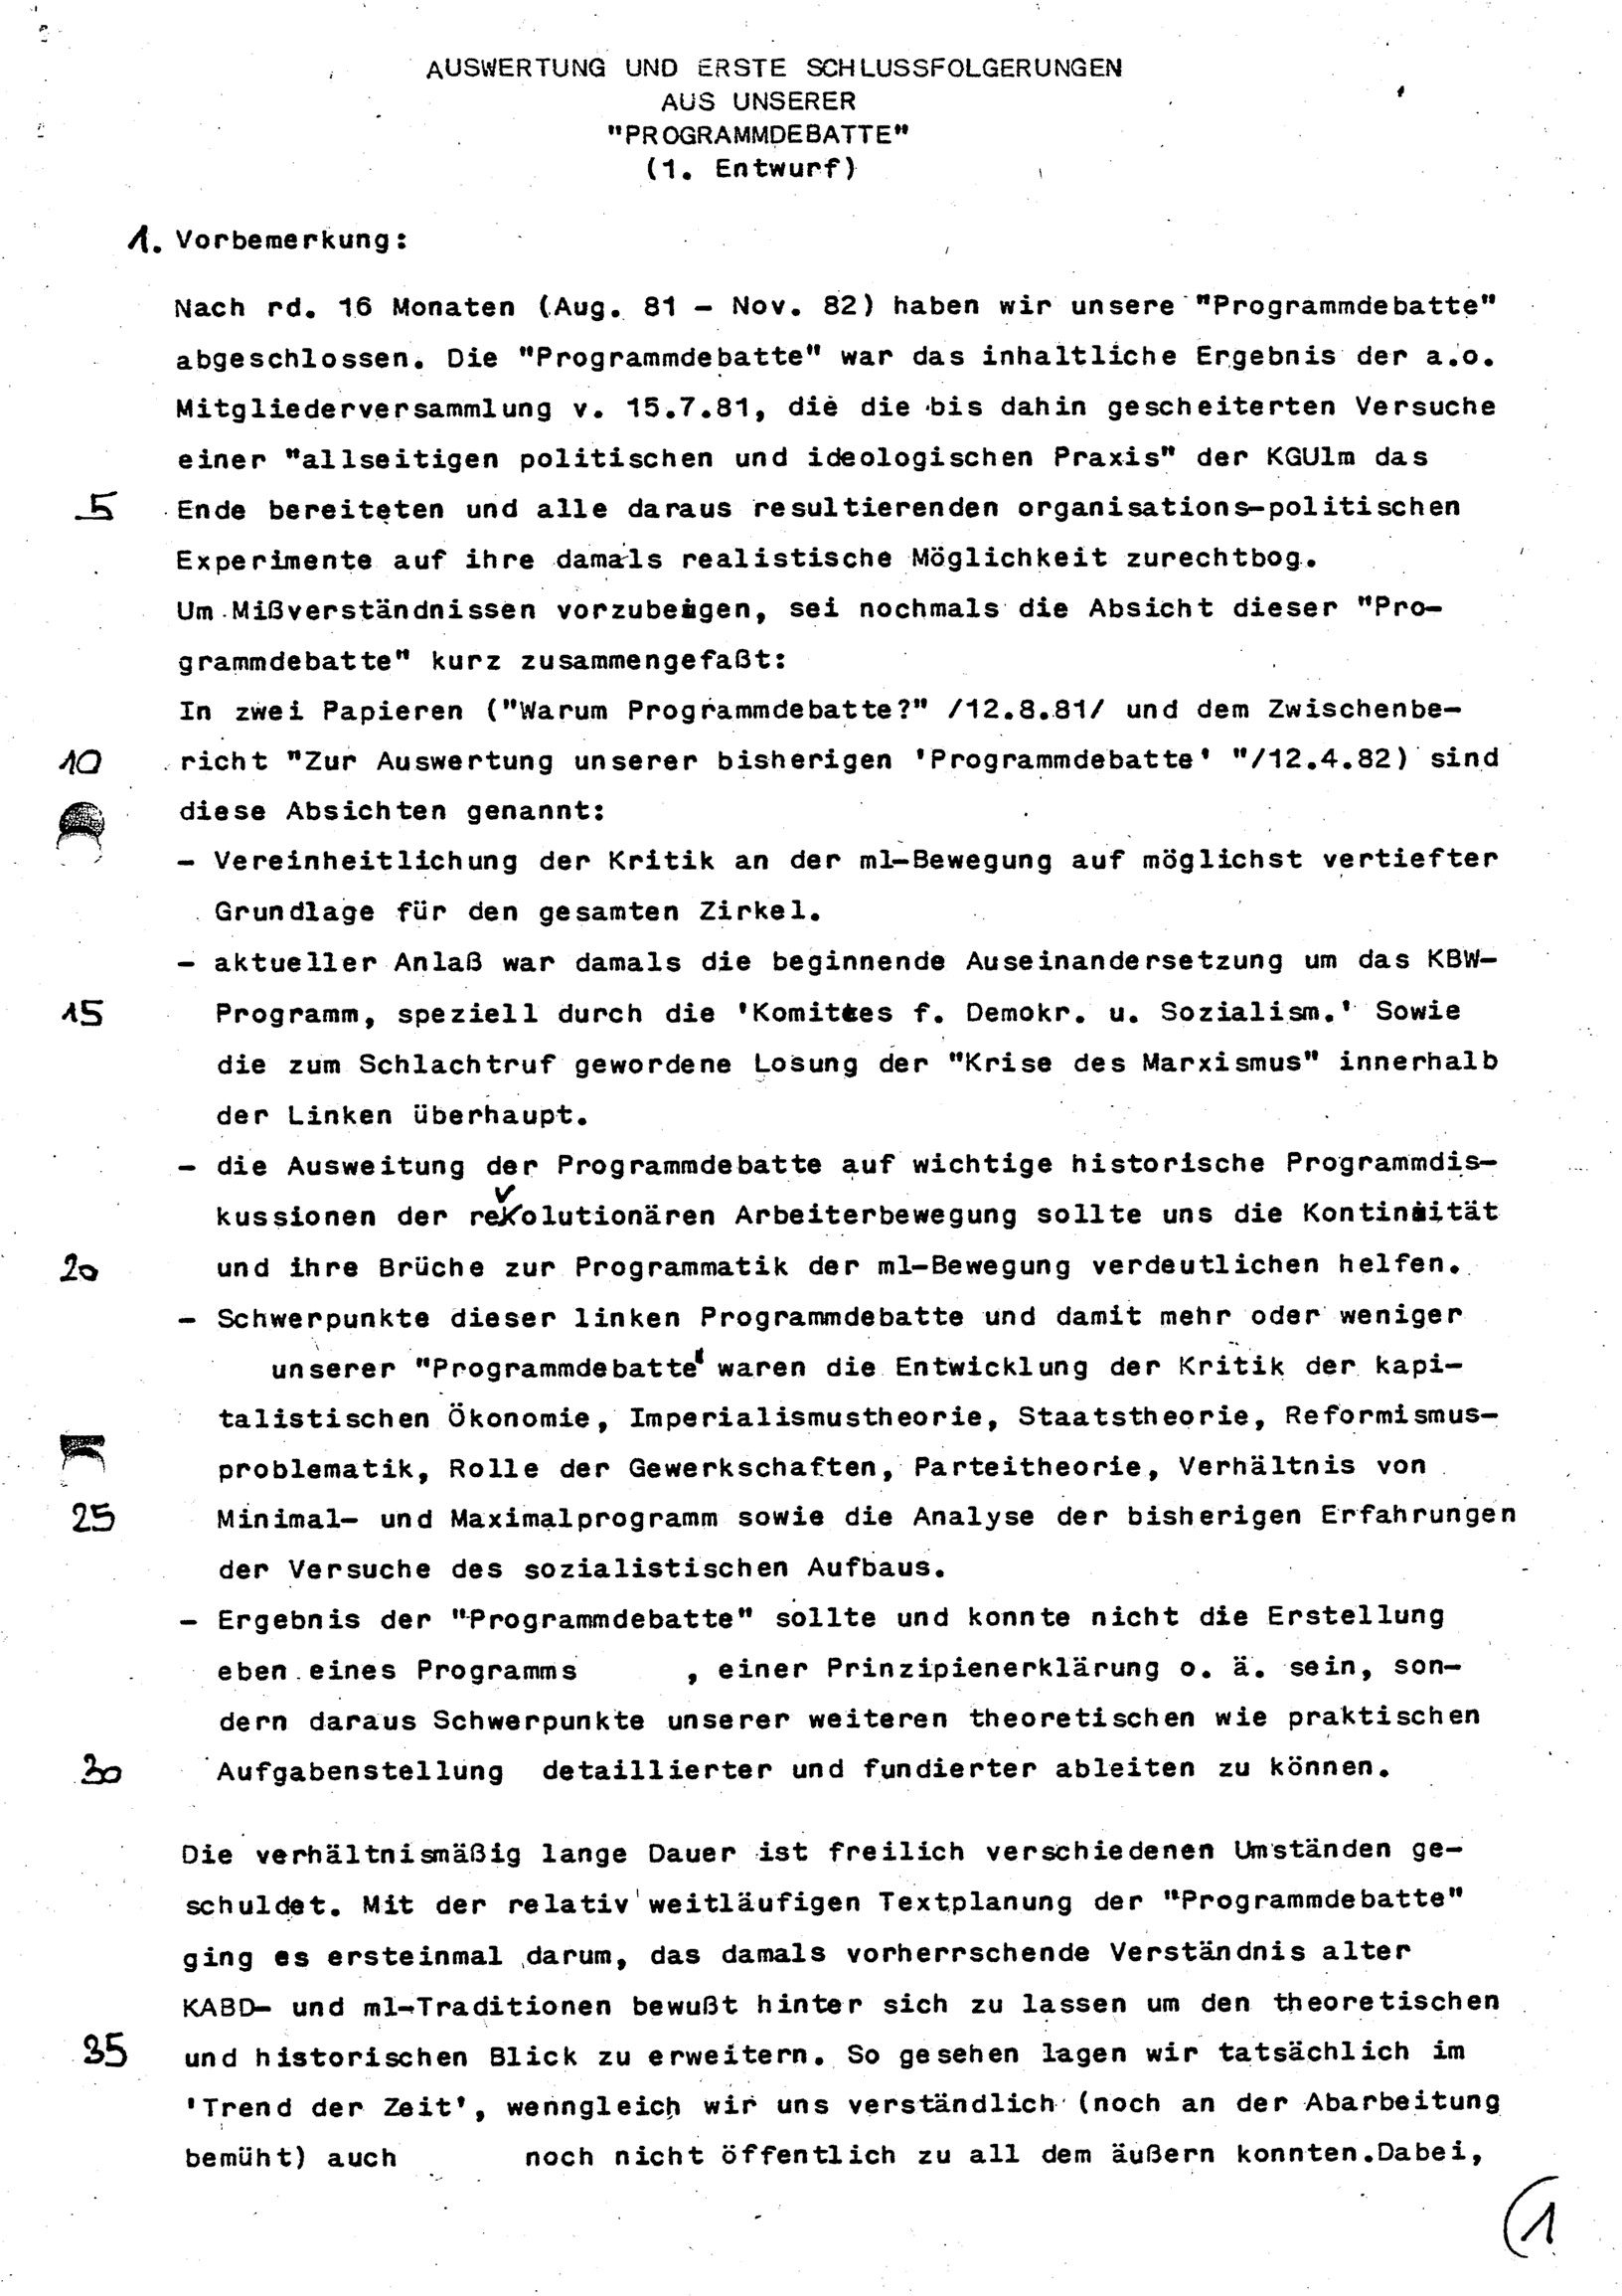 Ulm_KGU_Arbeitsheft_19830425_015_003